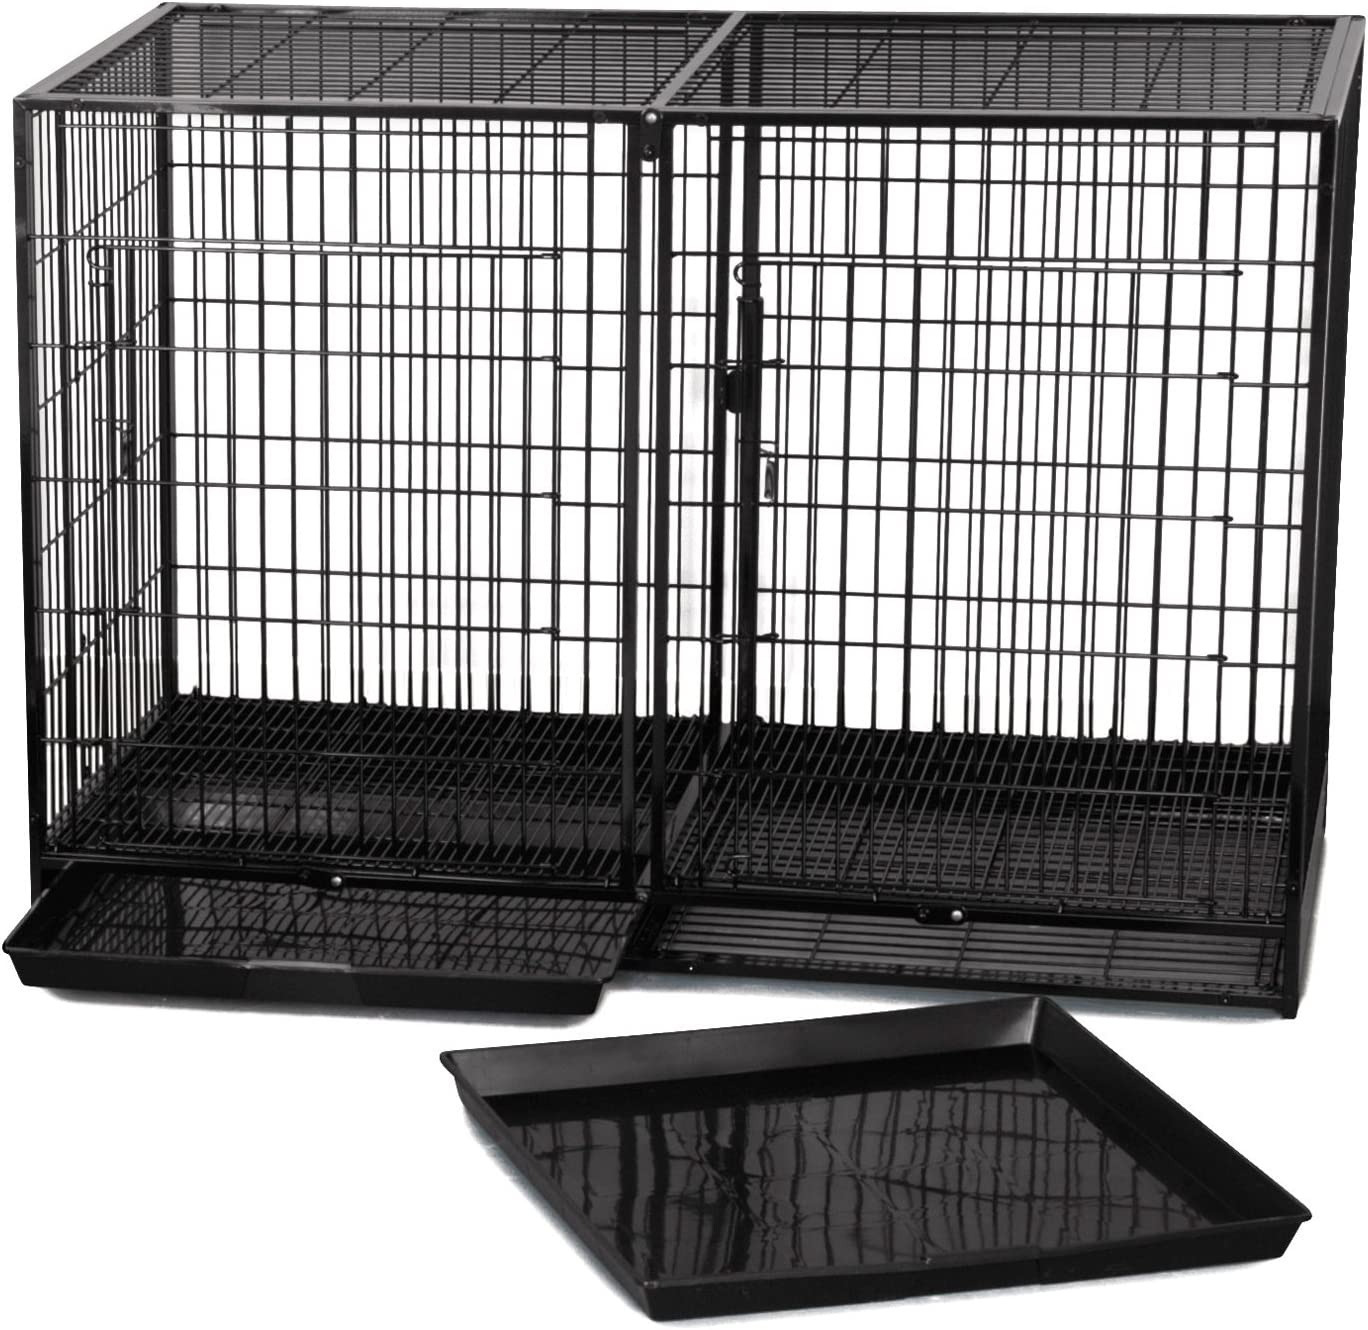 Pro Select Steel San Francisco Mall Modular Cage Ranking TOP4 Black X-Tall